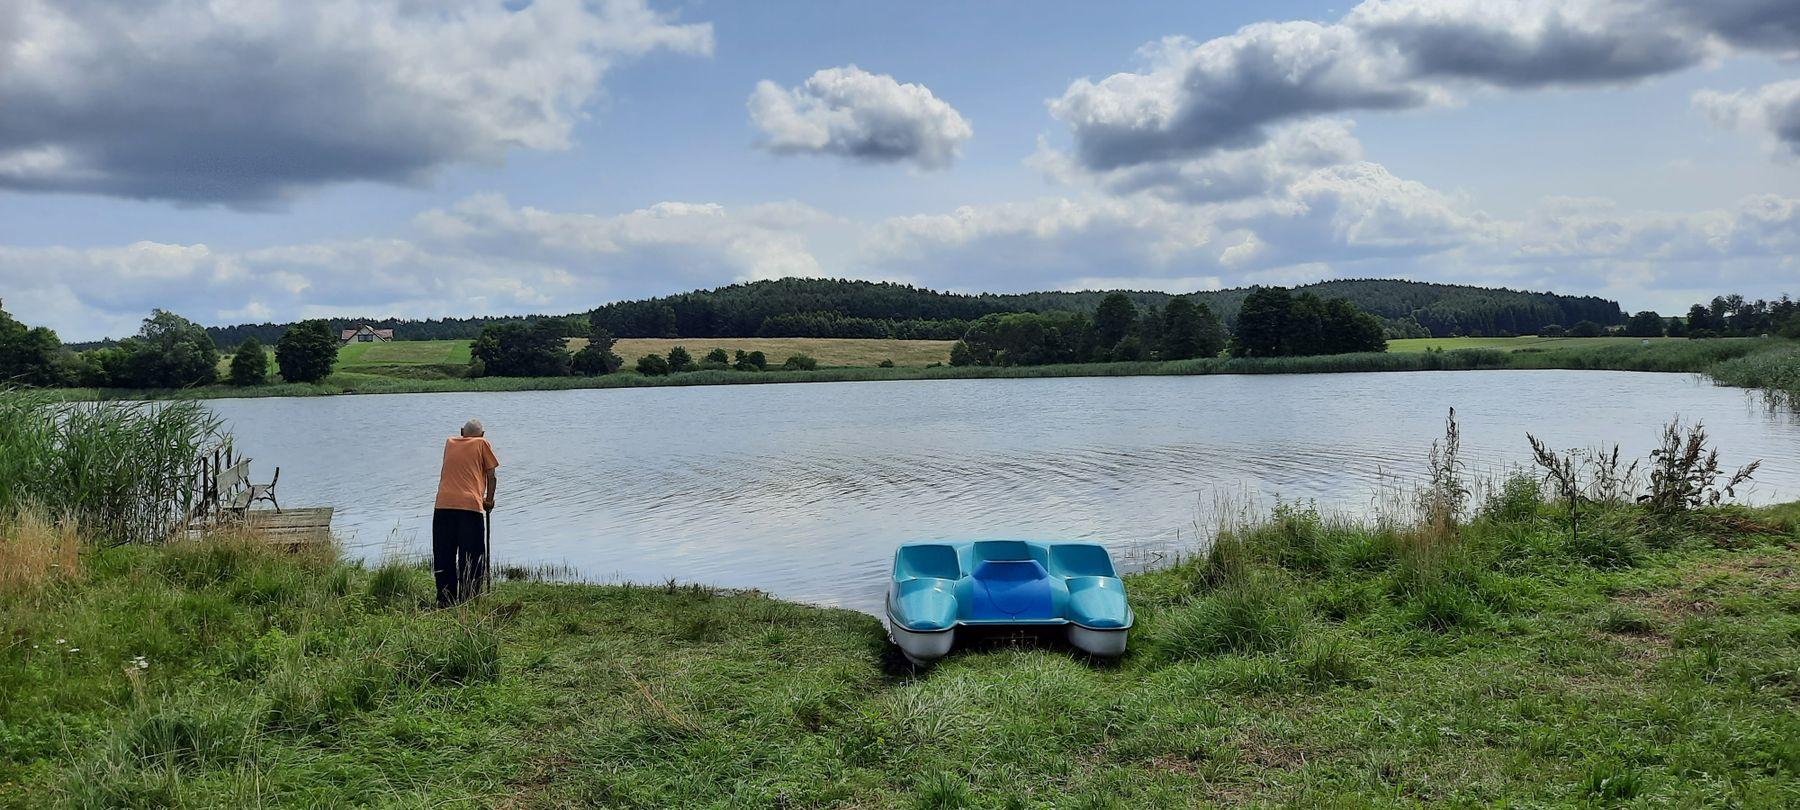 На берегу озера озера Польша озера Польша